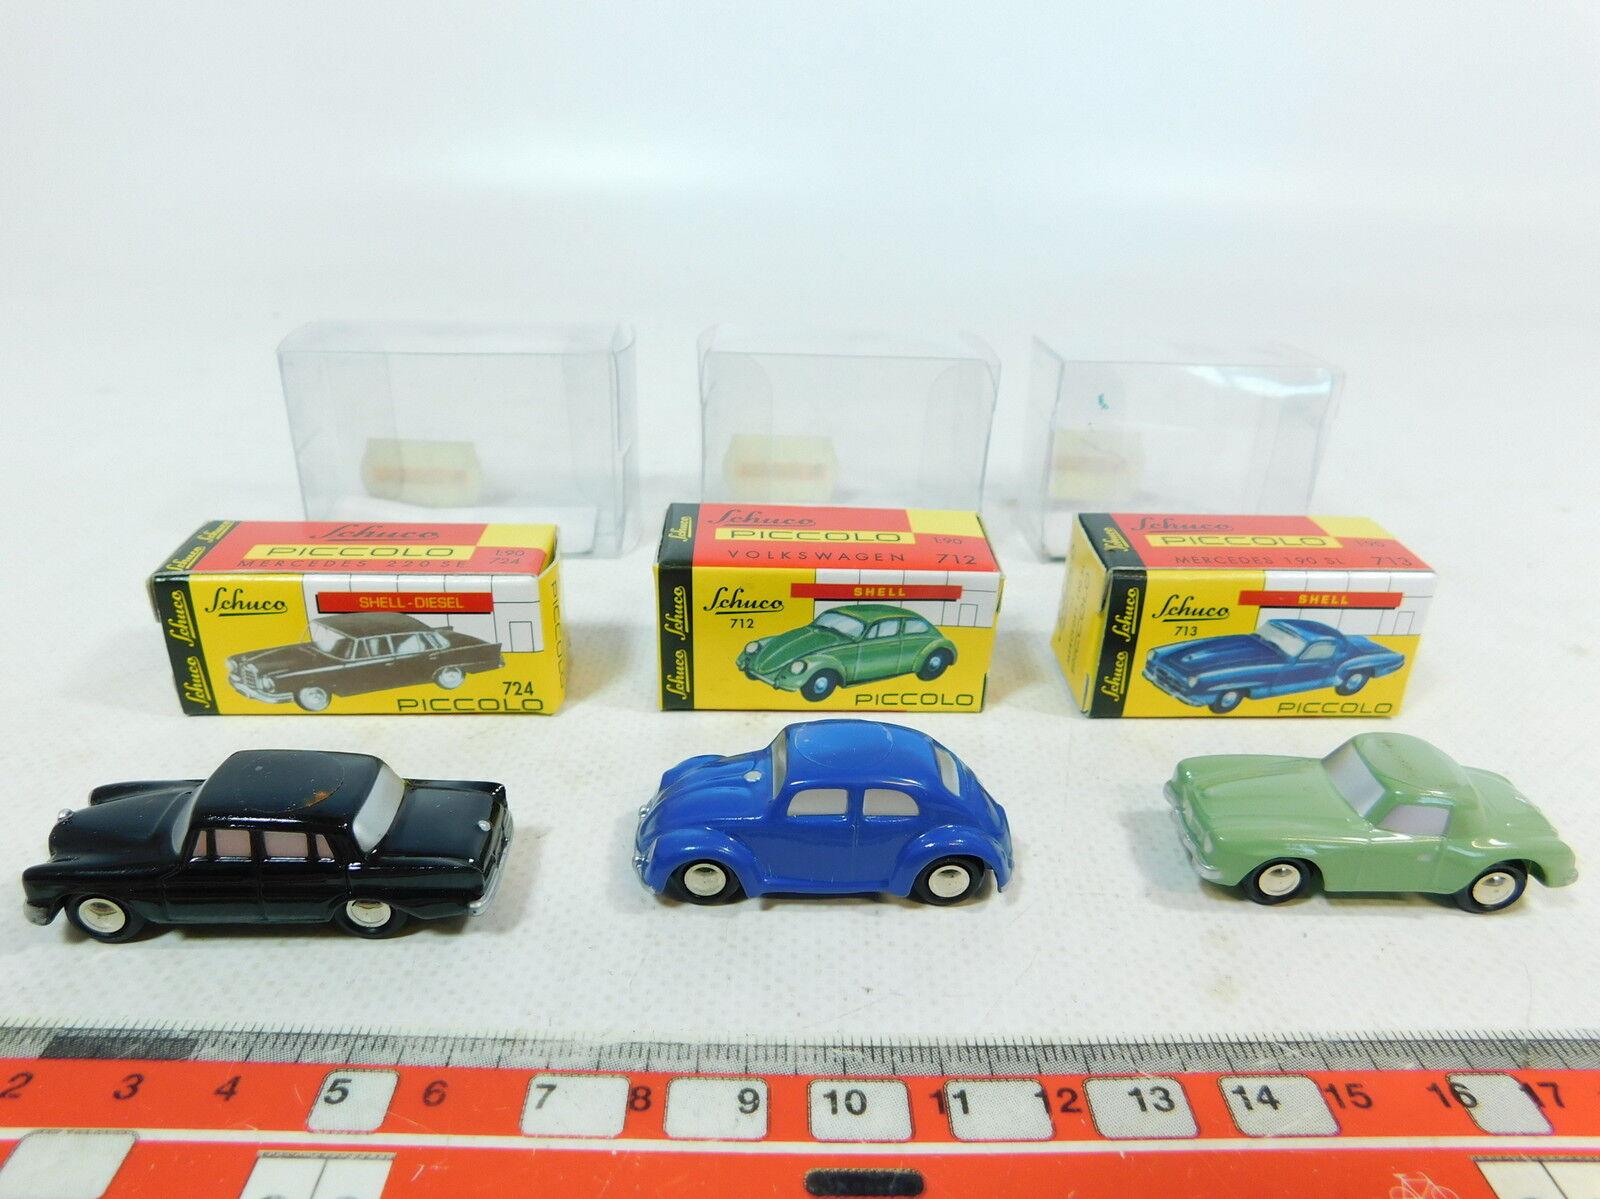 Ax780-0, 5  3x roadster Piccolo 1 1 1 90 modelo  01261 VW 712+01241 01251 MB, Neuw + embalaje original e4f700